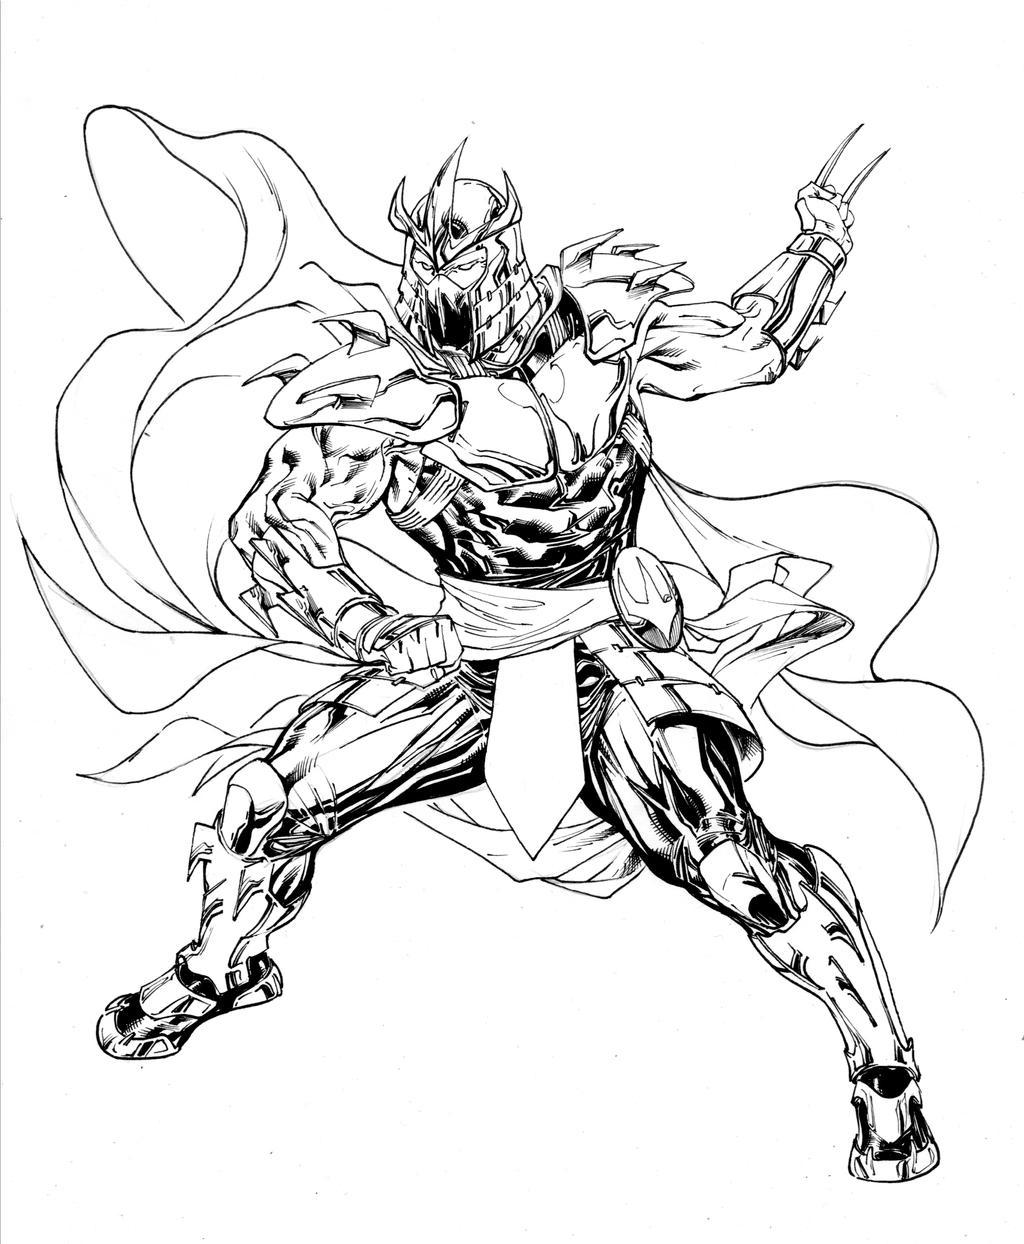 shredder by spiderguile on deviantart